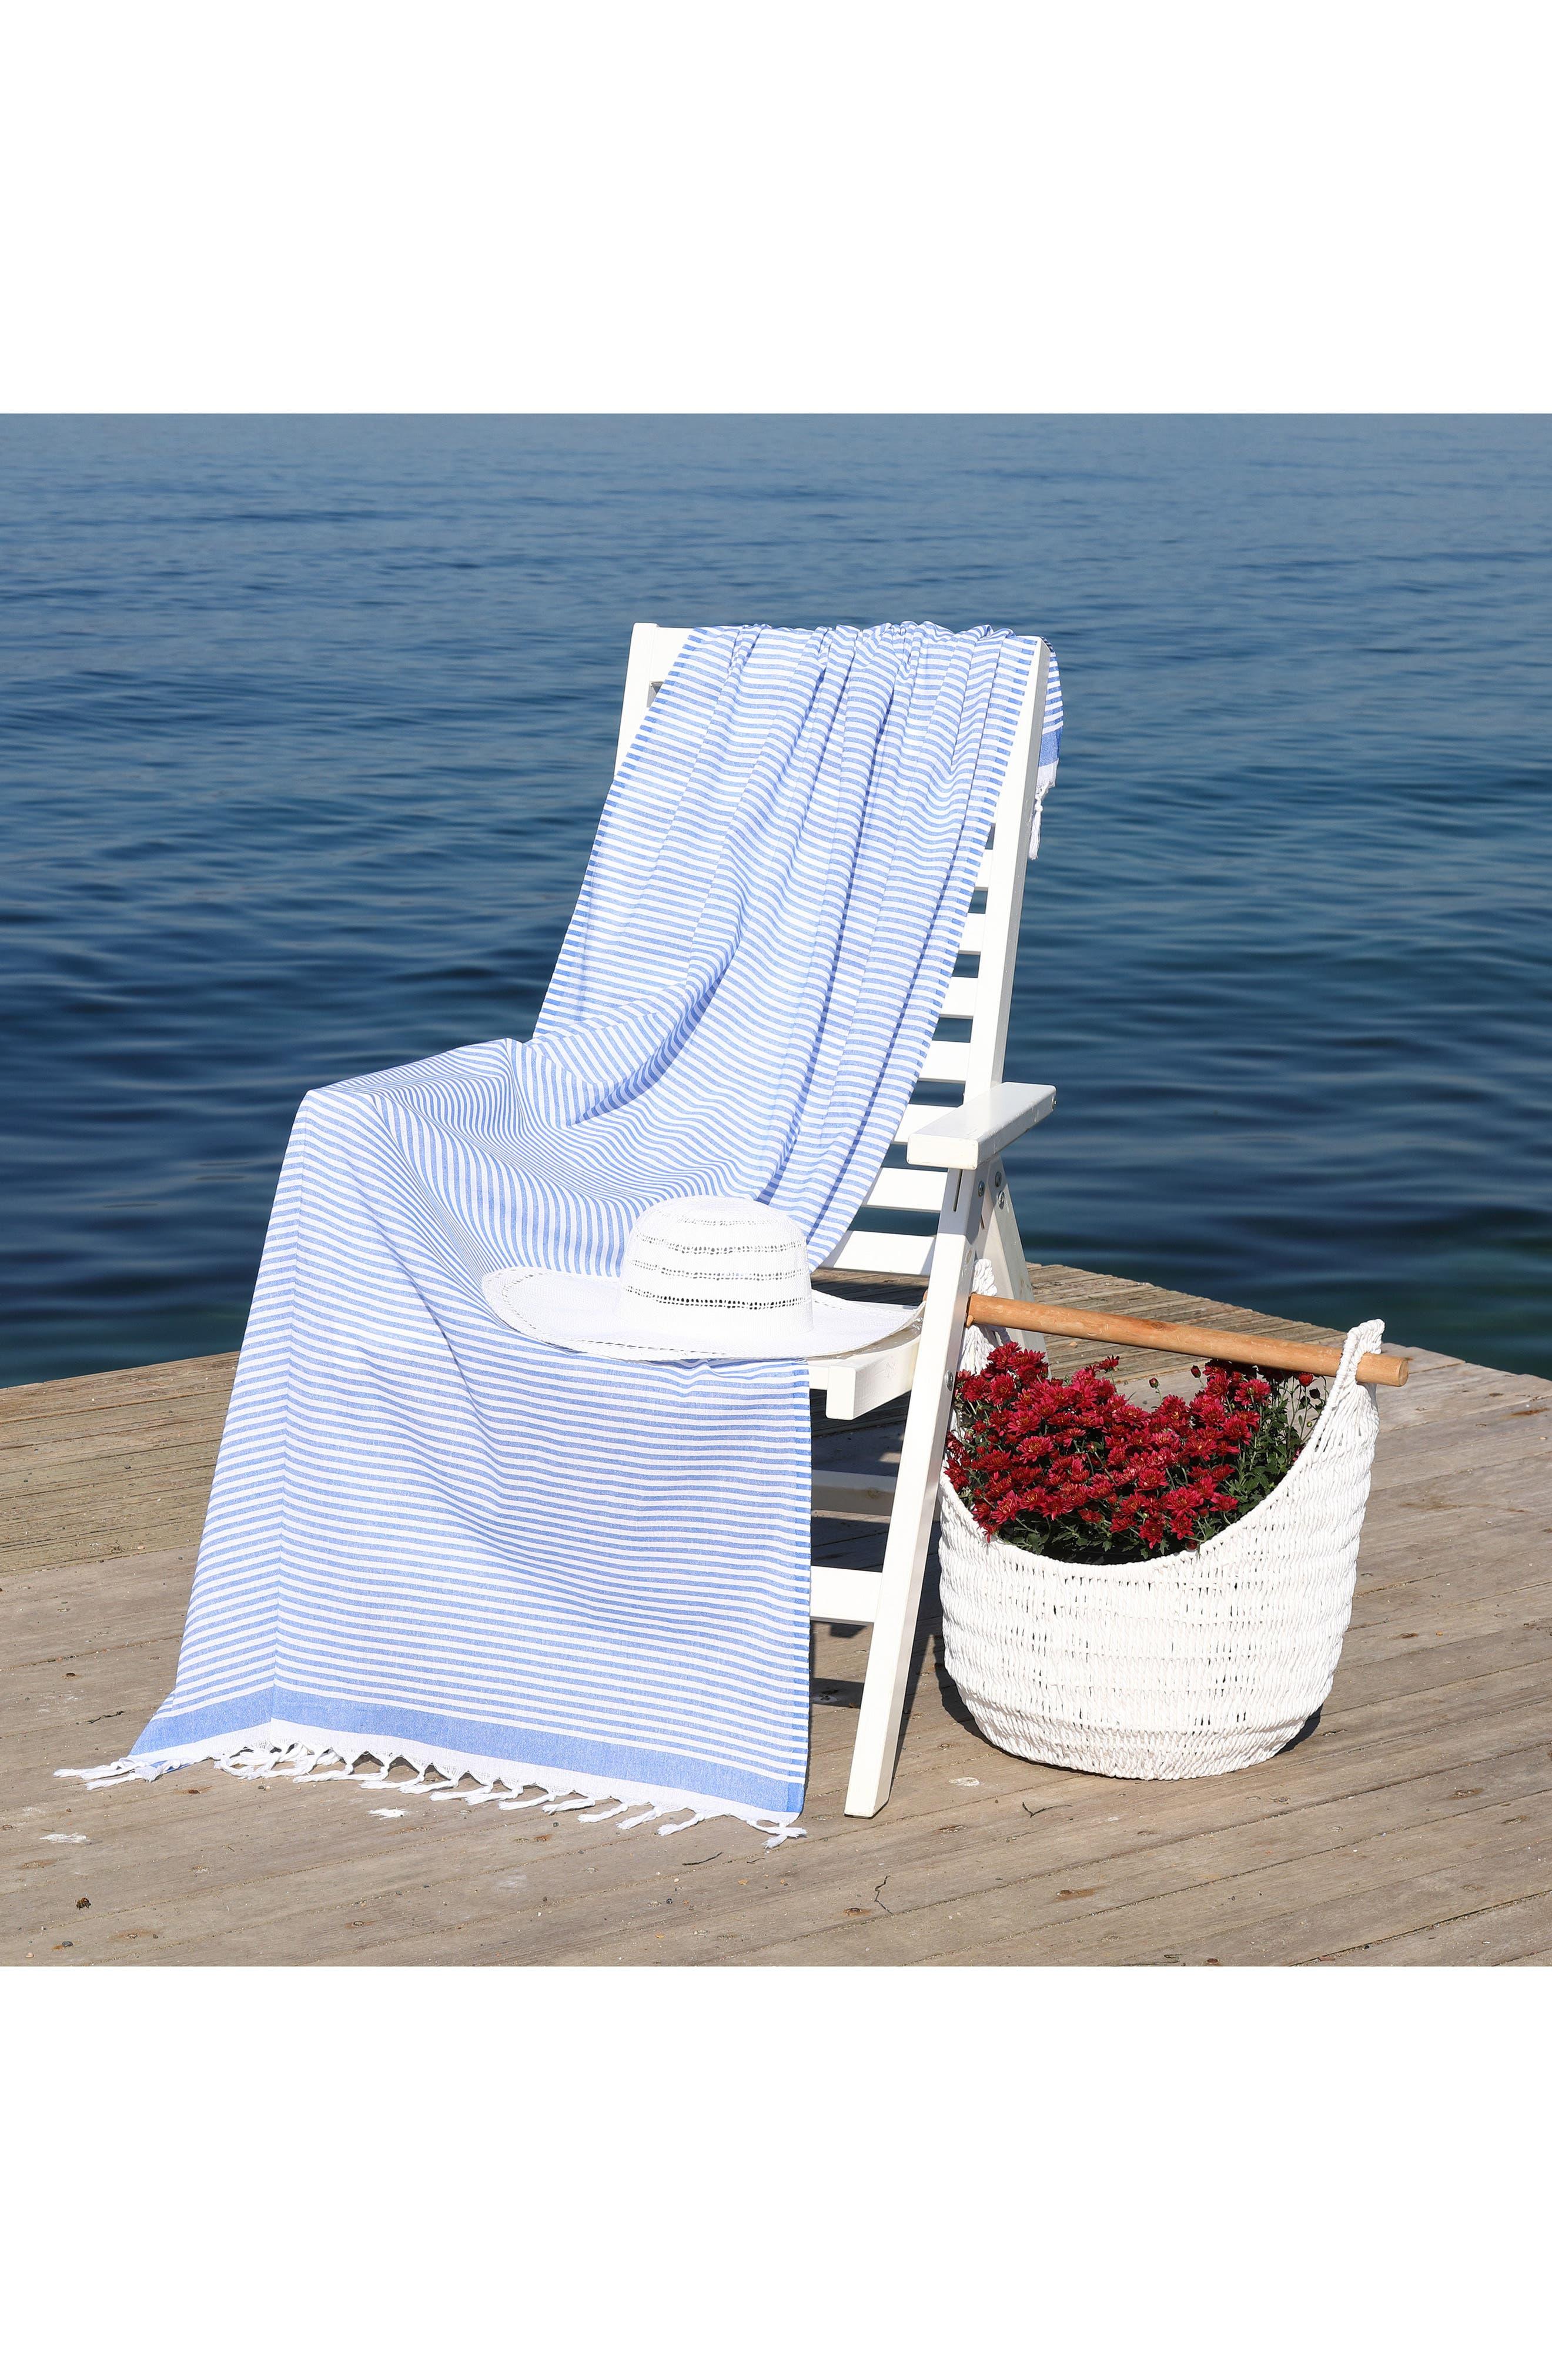 Soft Stripes Turkish Pestemal Towel,                             Alternate thumbnail 11, color,                             BLACK